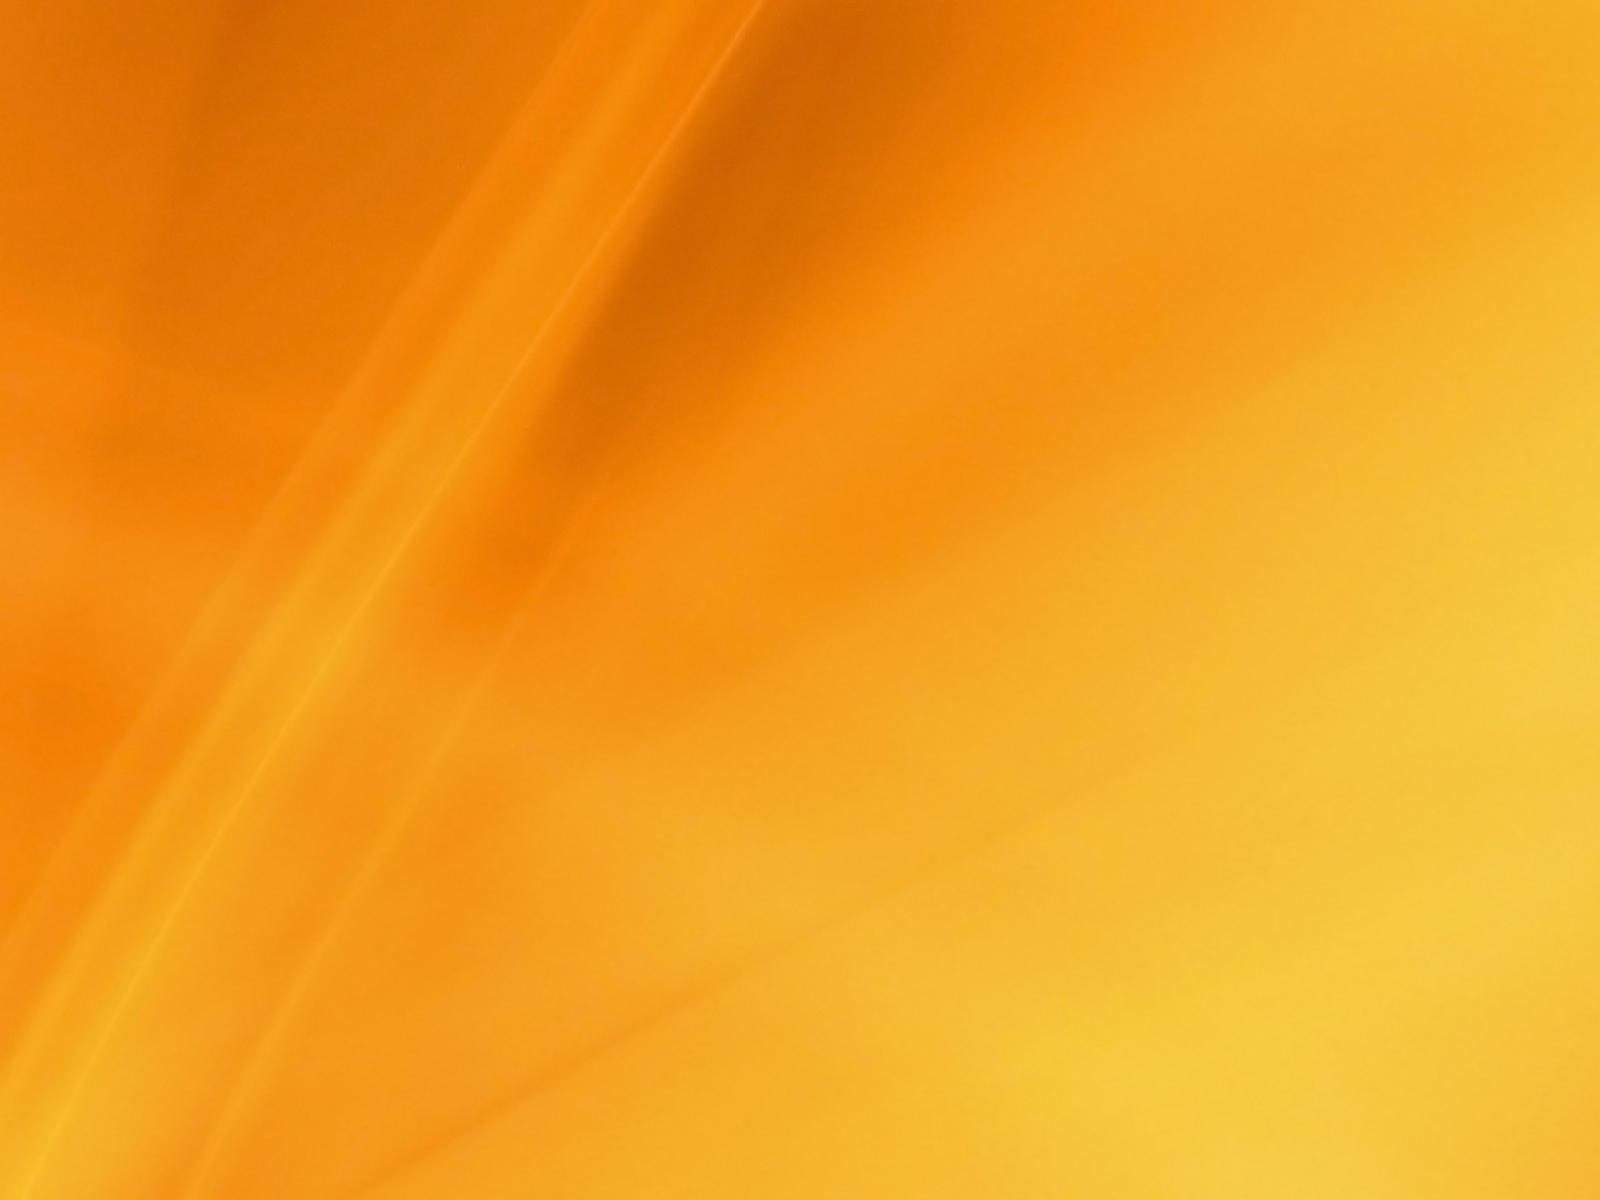 Amber Lights By BlackHorizon On DeviantArt